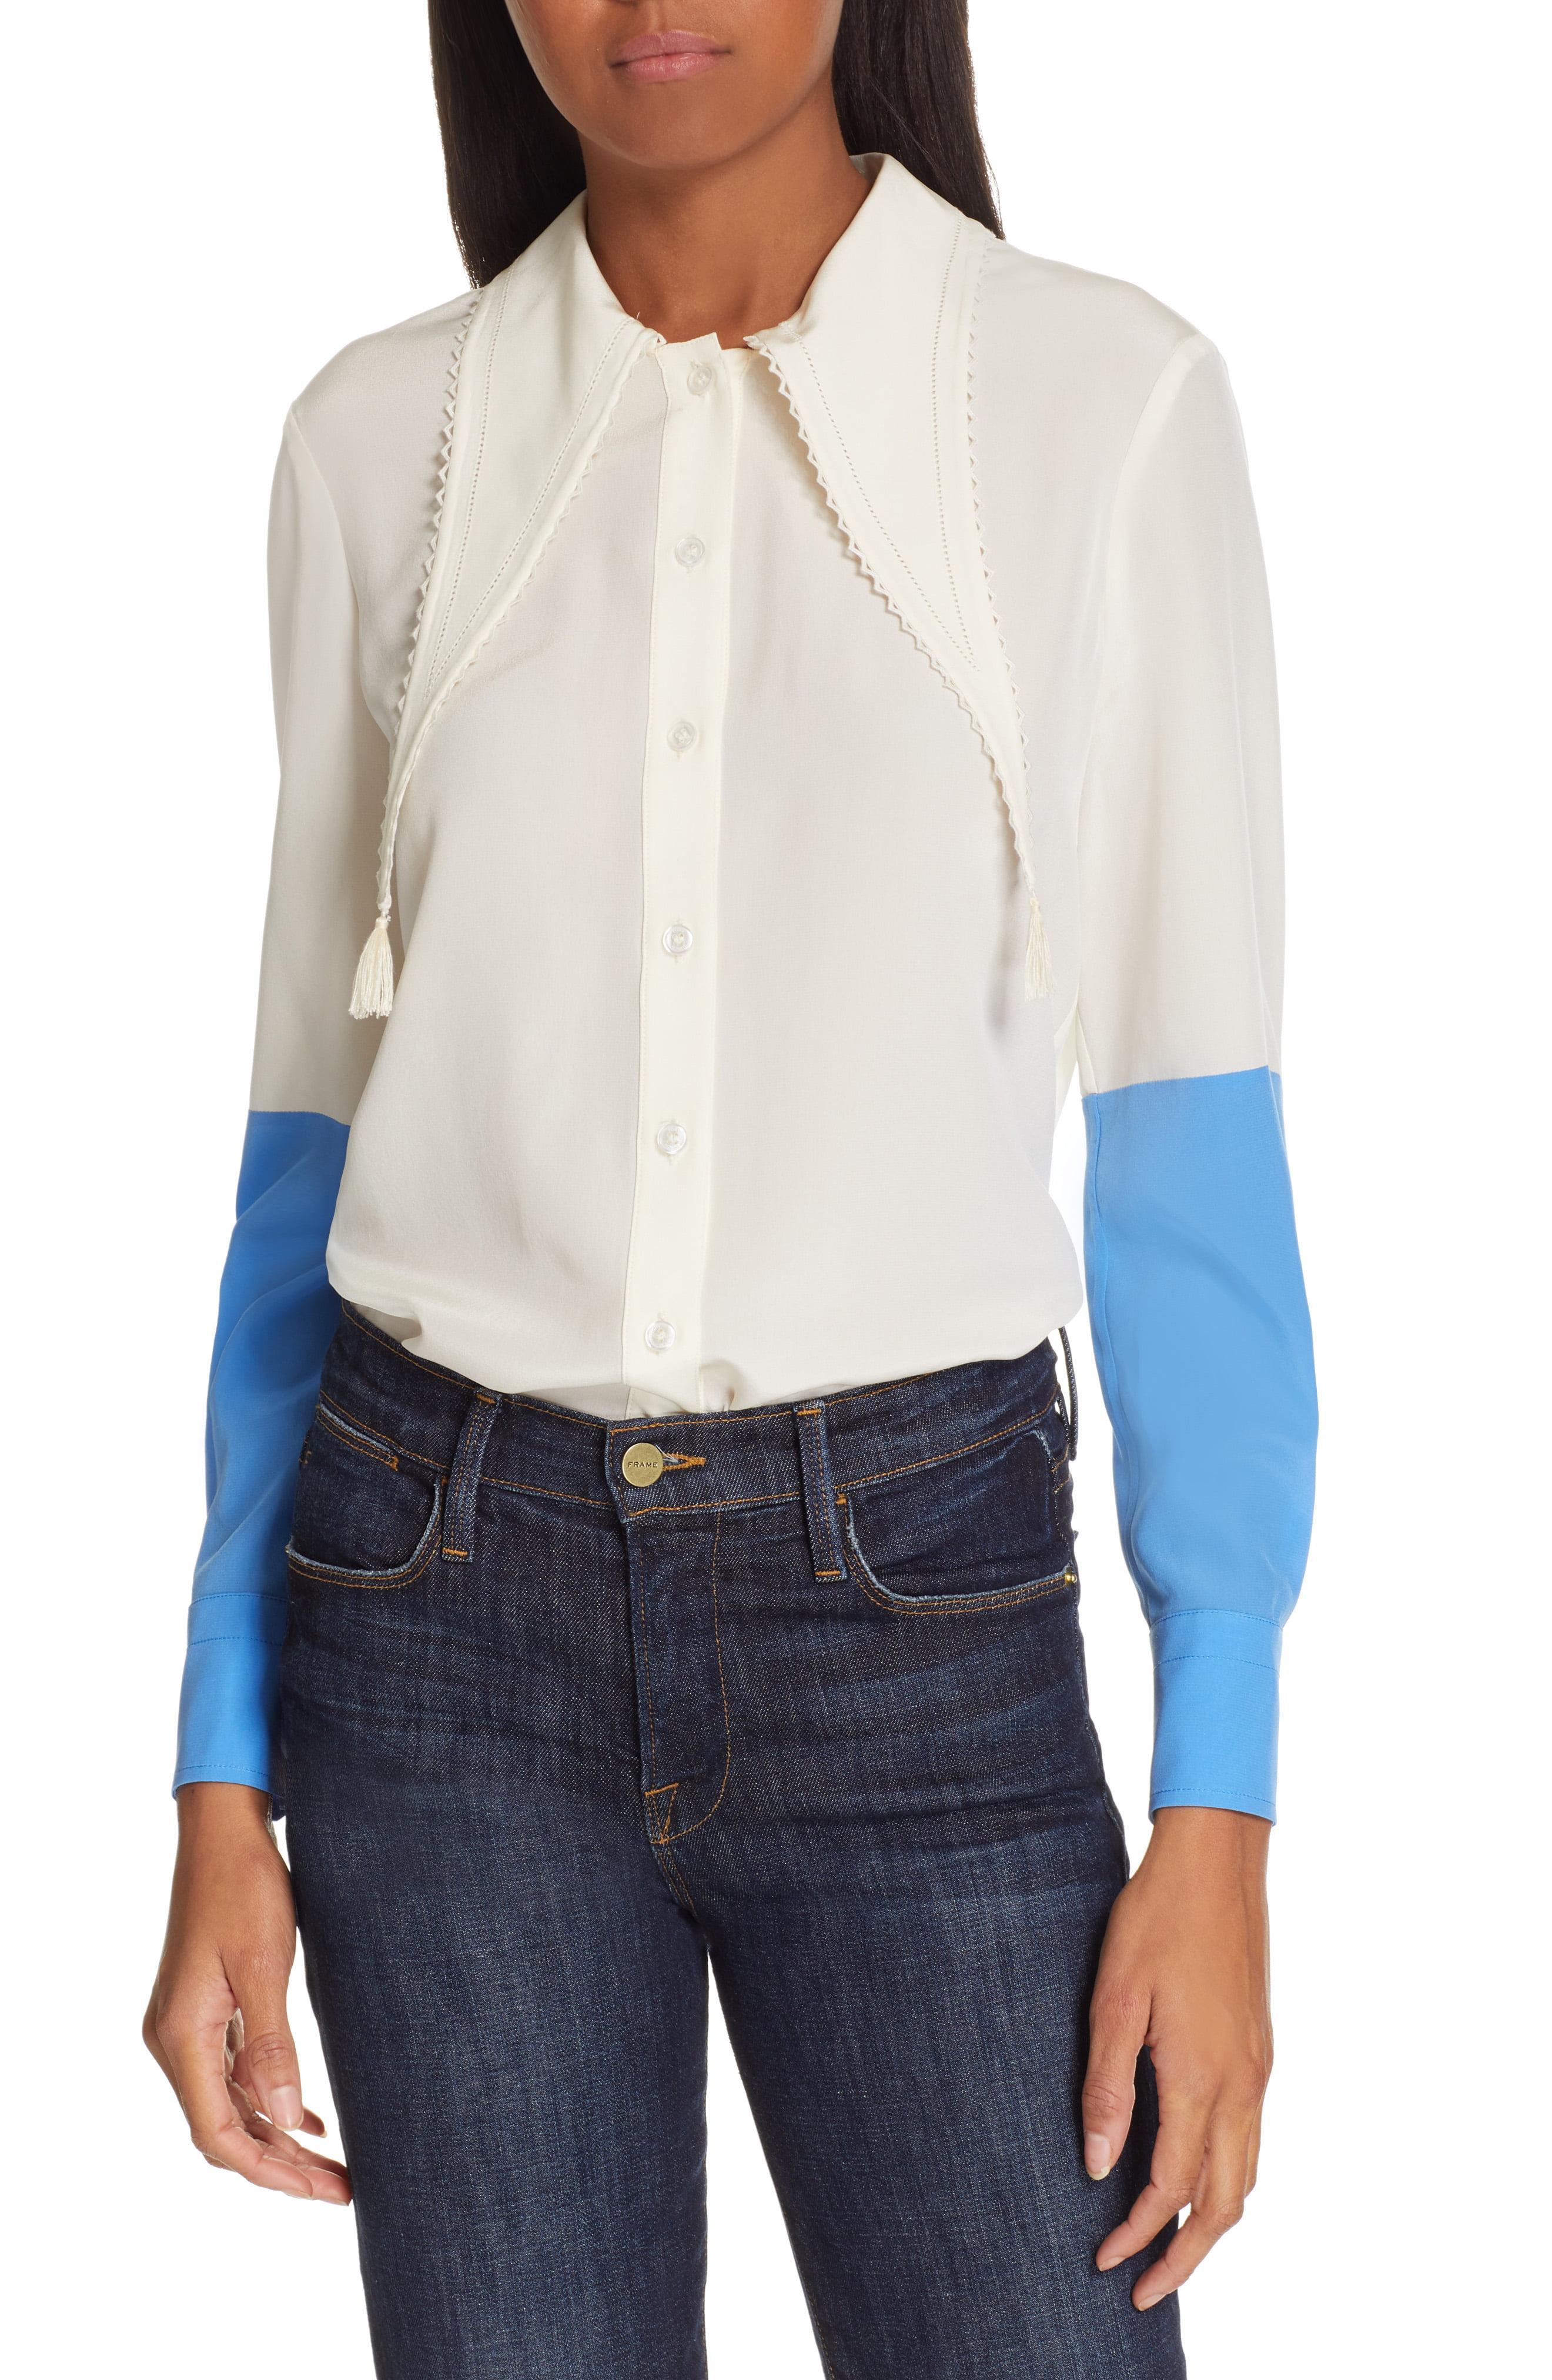 a2675beedcffc Lyst - Tory Burch Tassel Collar Silk Blouse in Blue